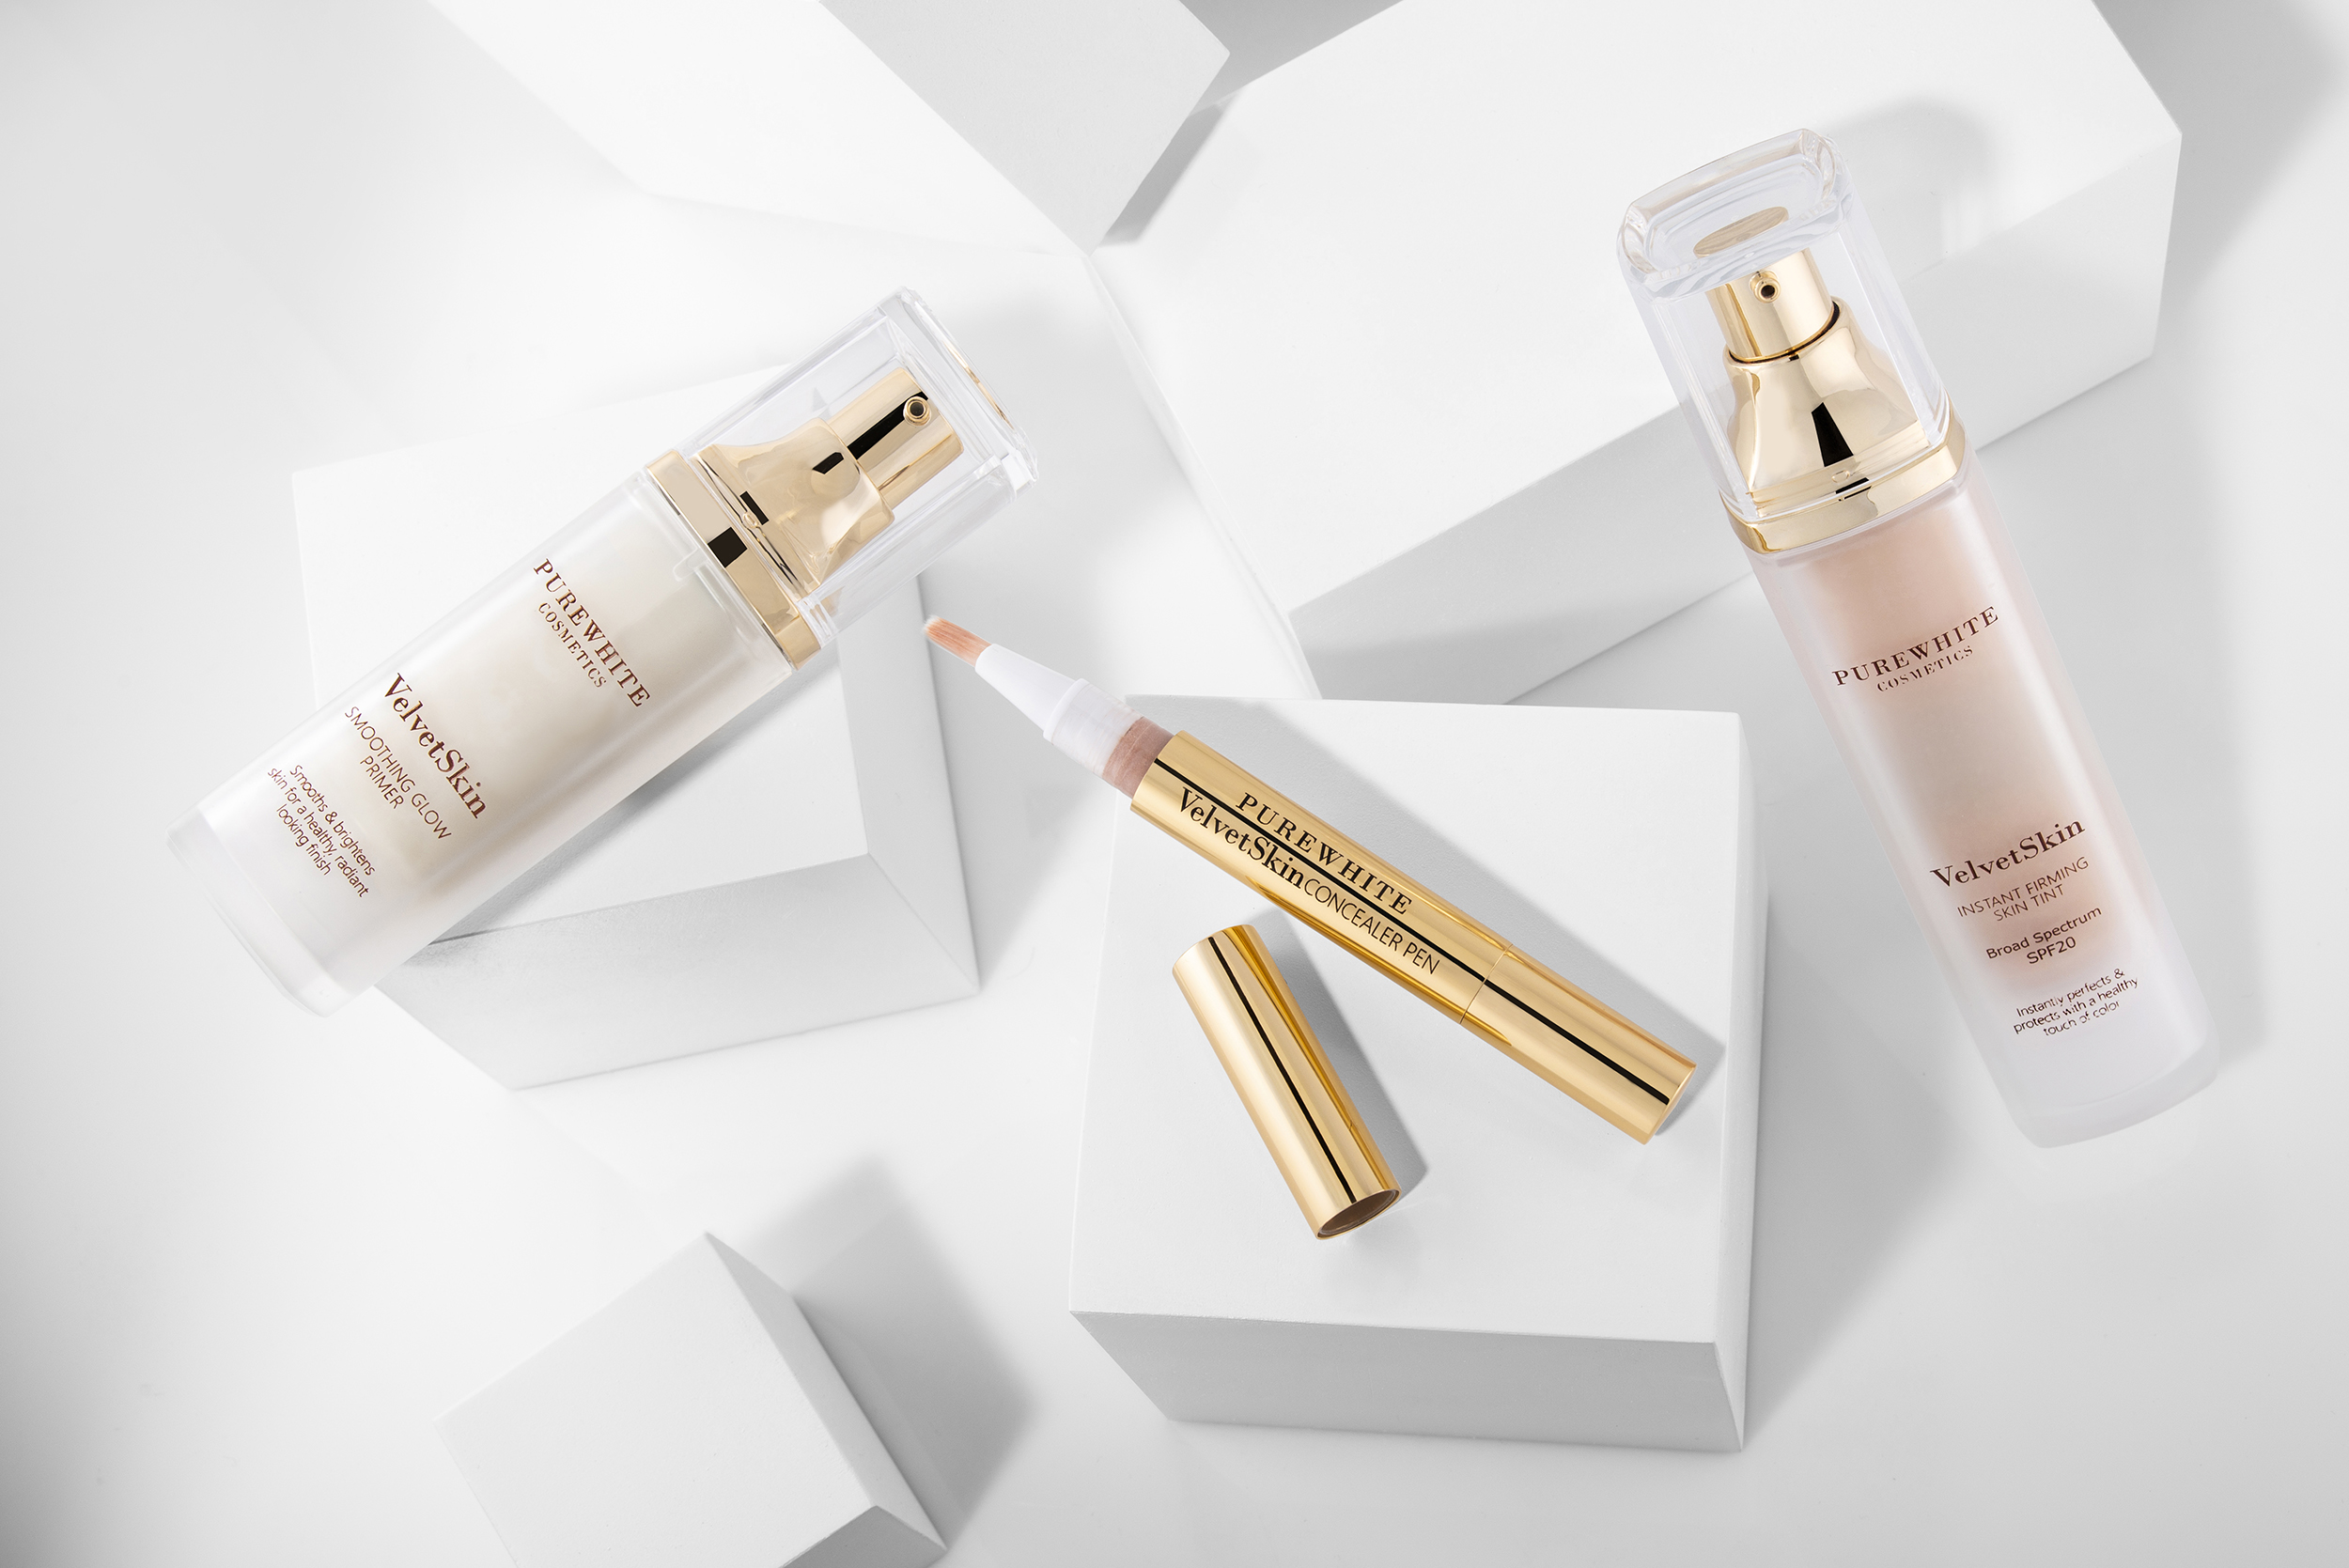 Pure White Cosmetics - VelvetSkin Collection